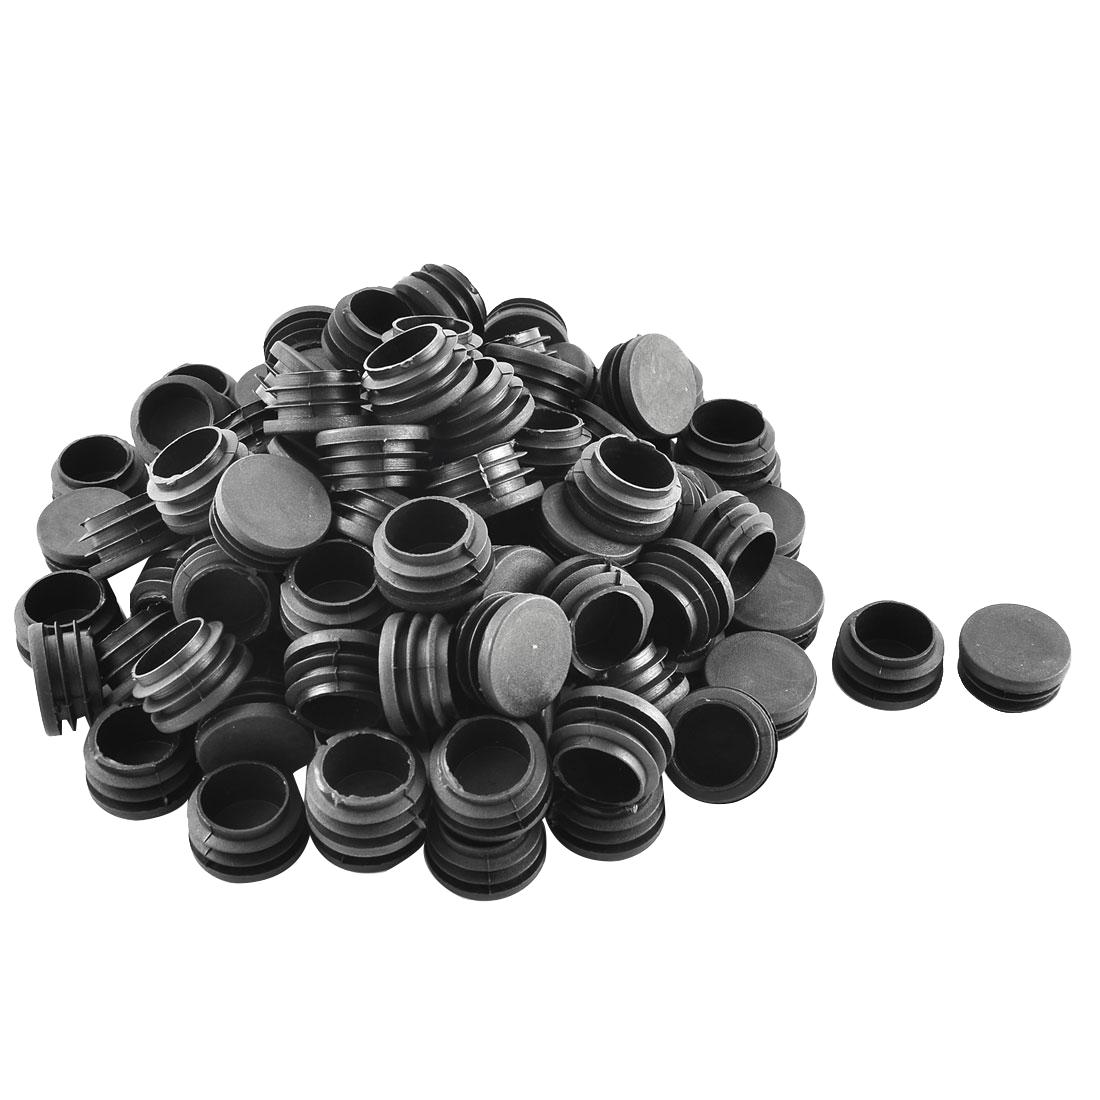 Plastic Round Ribbed Tube Inserts End Blanking Caps Black 32mm Diameter 100 Pcs